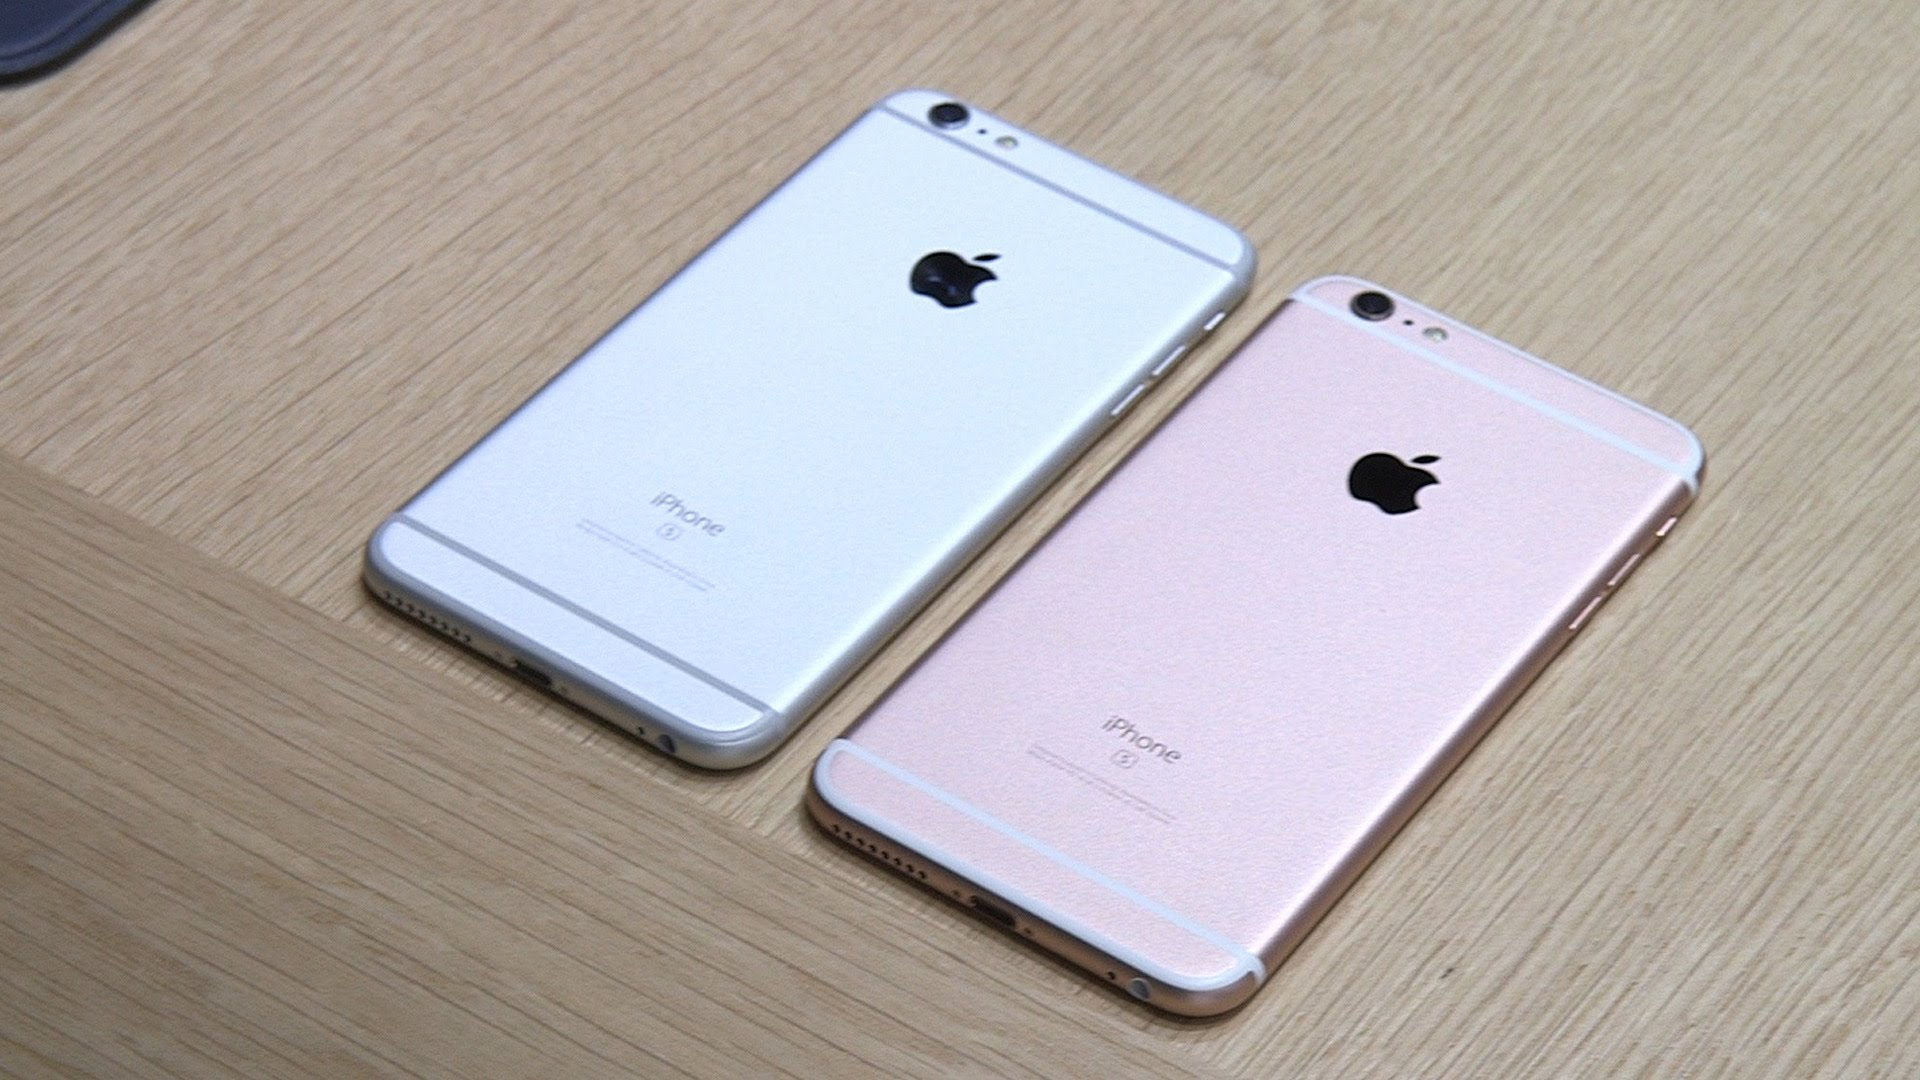 Apple iPhone 6s – iphone 7 alternative